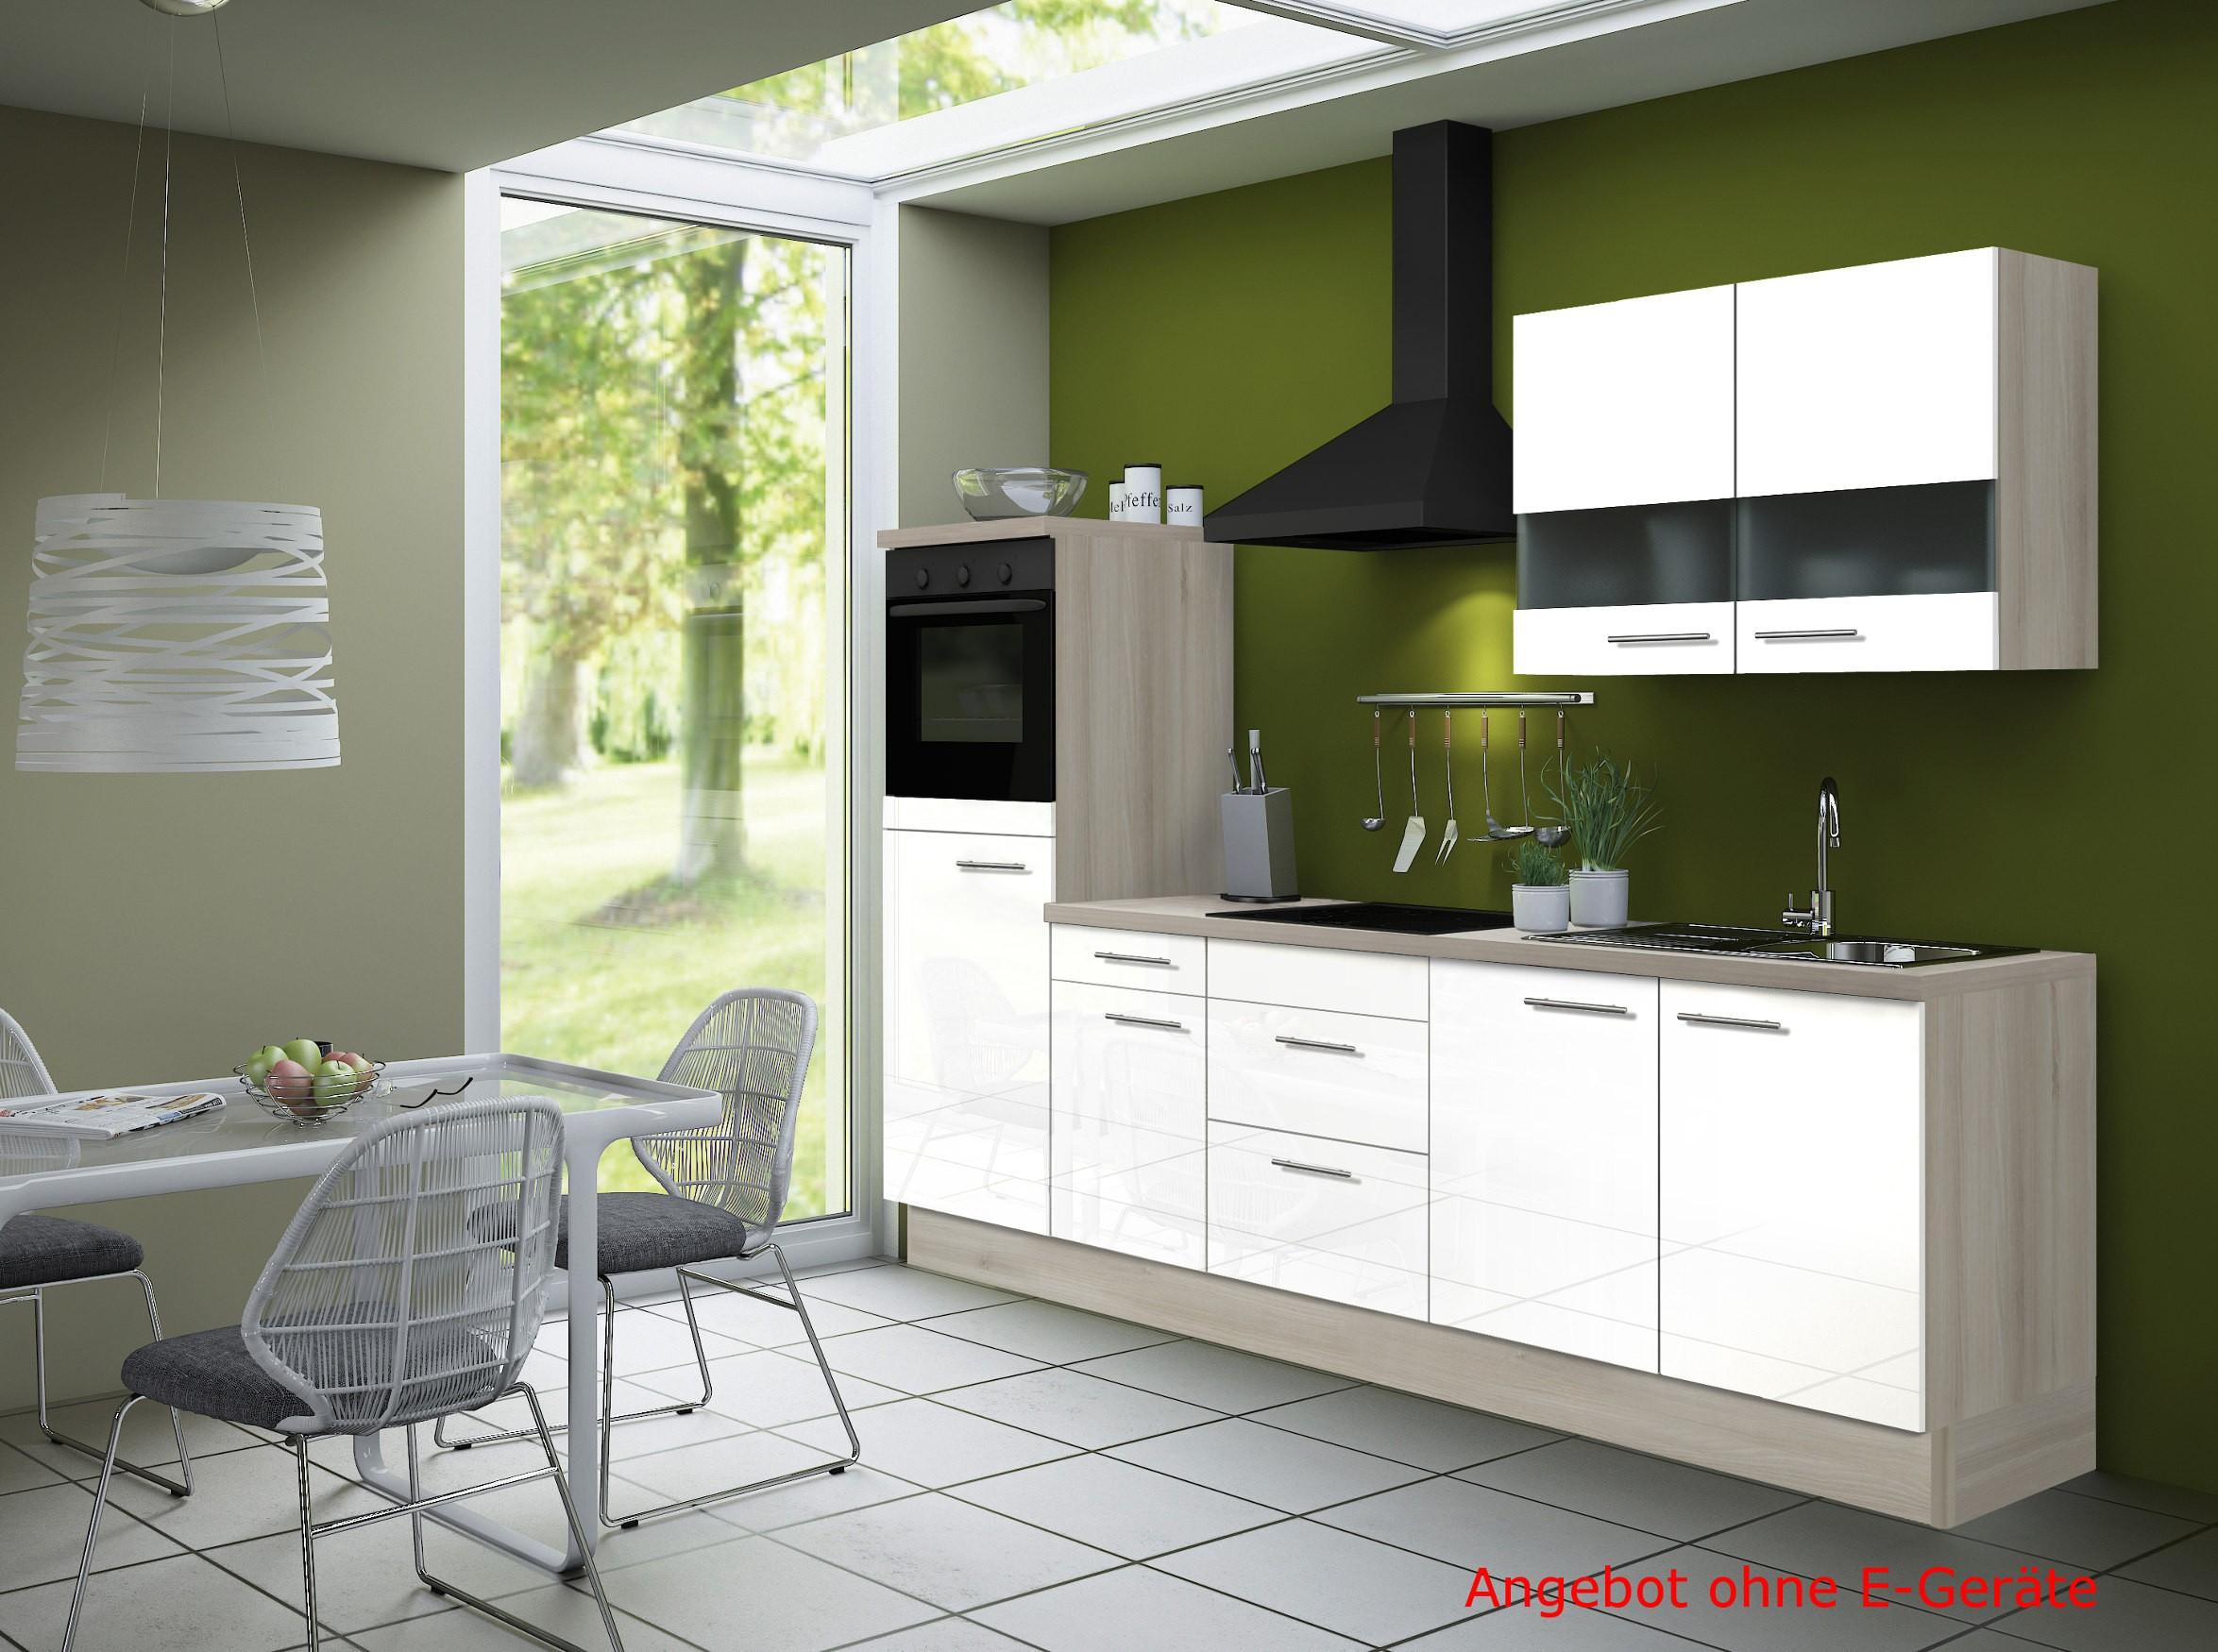 k chenblock leon k chenzeile k che ohne elektro ger te. Black Bedroom Furniture Sets. Home Design Ideas